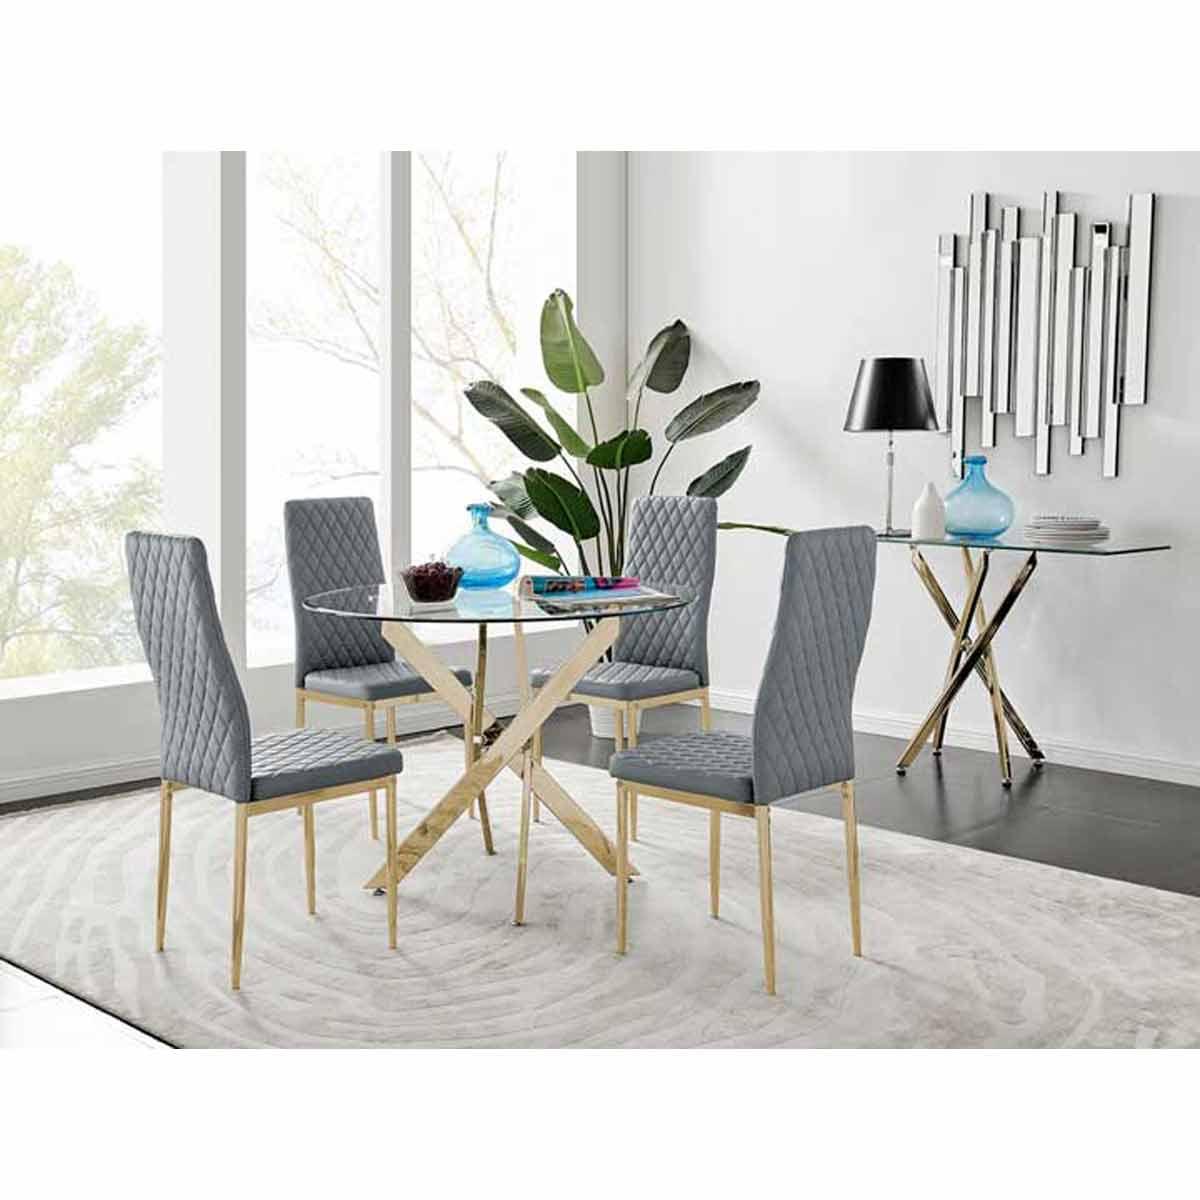 Furniture Box Novara 100cm Gold Round Dining Table and 4 Grey Gold Leg Milan Chairs